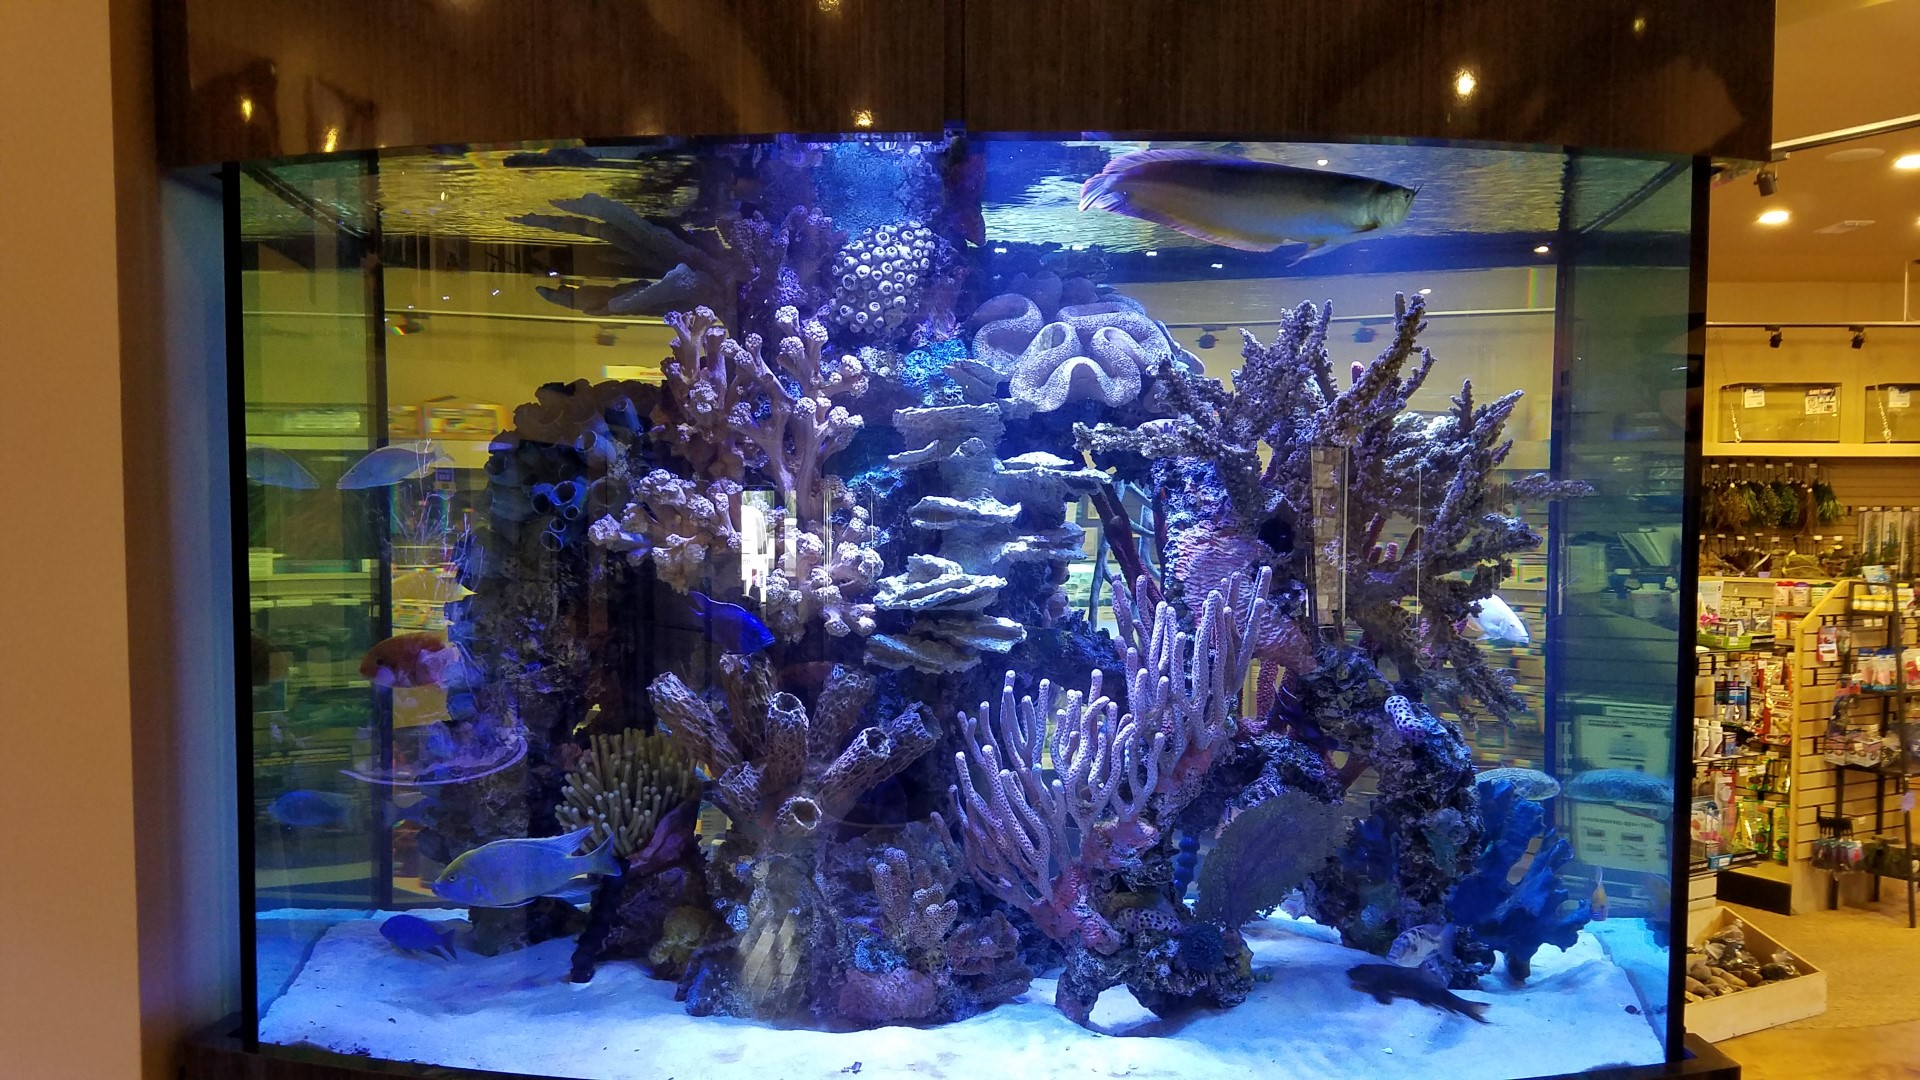 Freshwater aquarium fish dallas - Freshwater Aquarium Fish Dallas